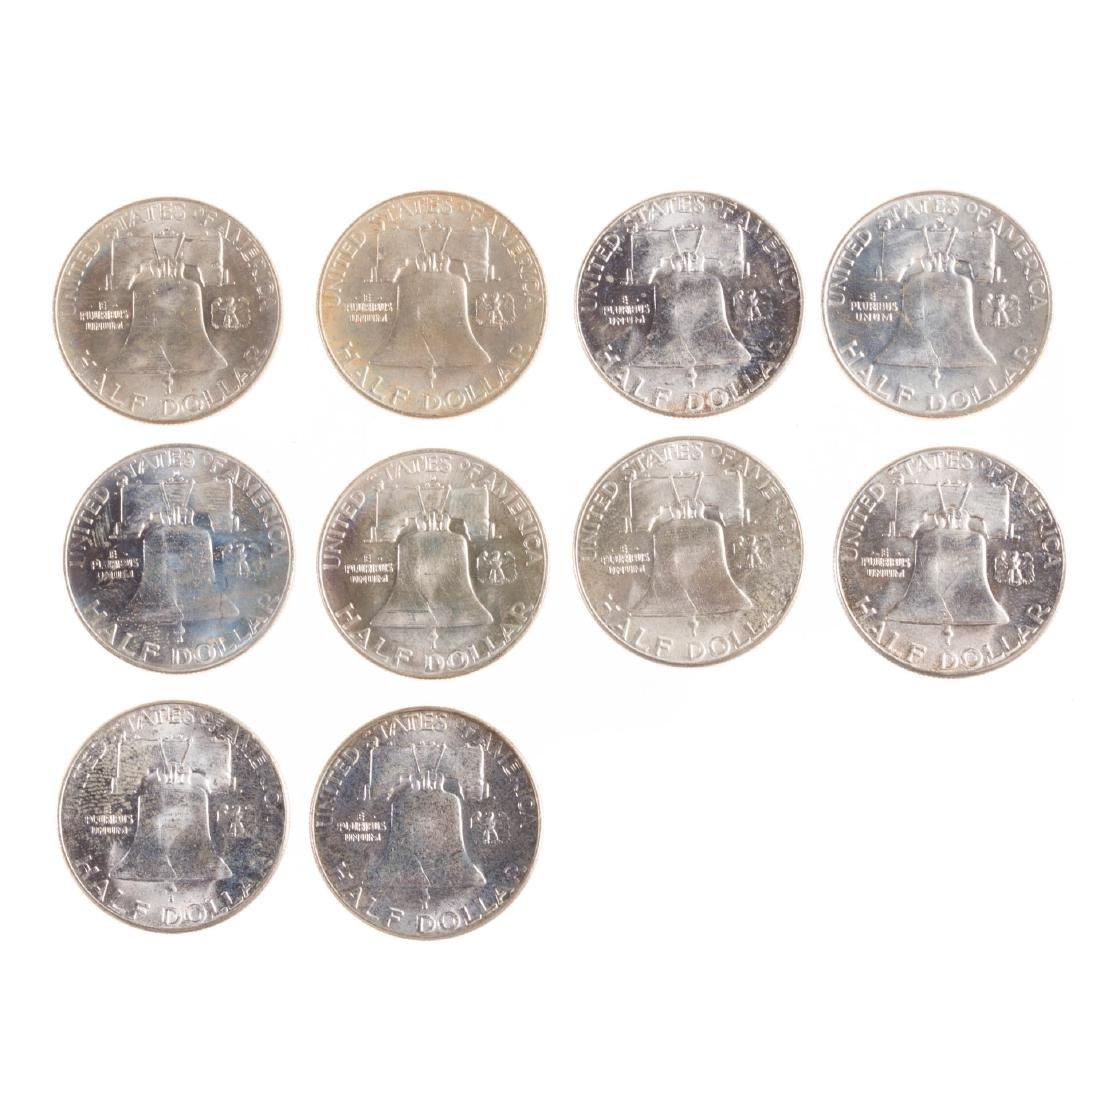 [US] Ten BU Franklin Halves - 2